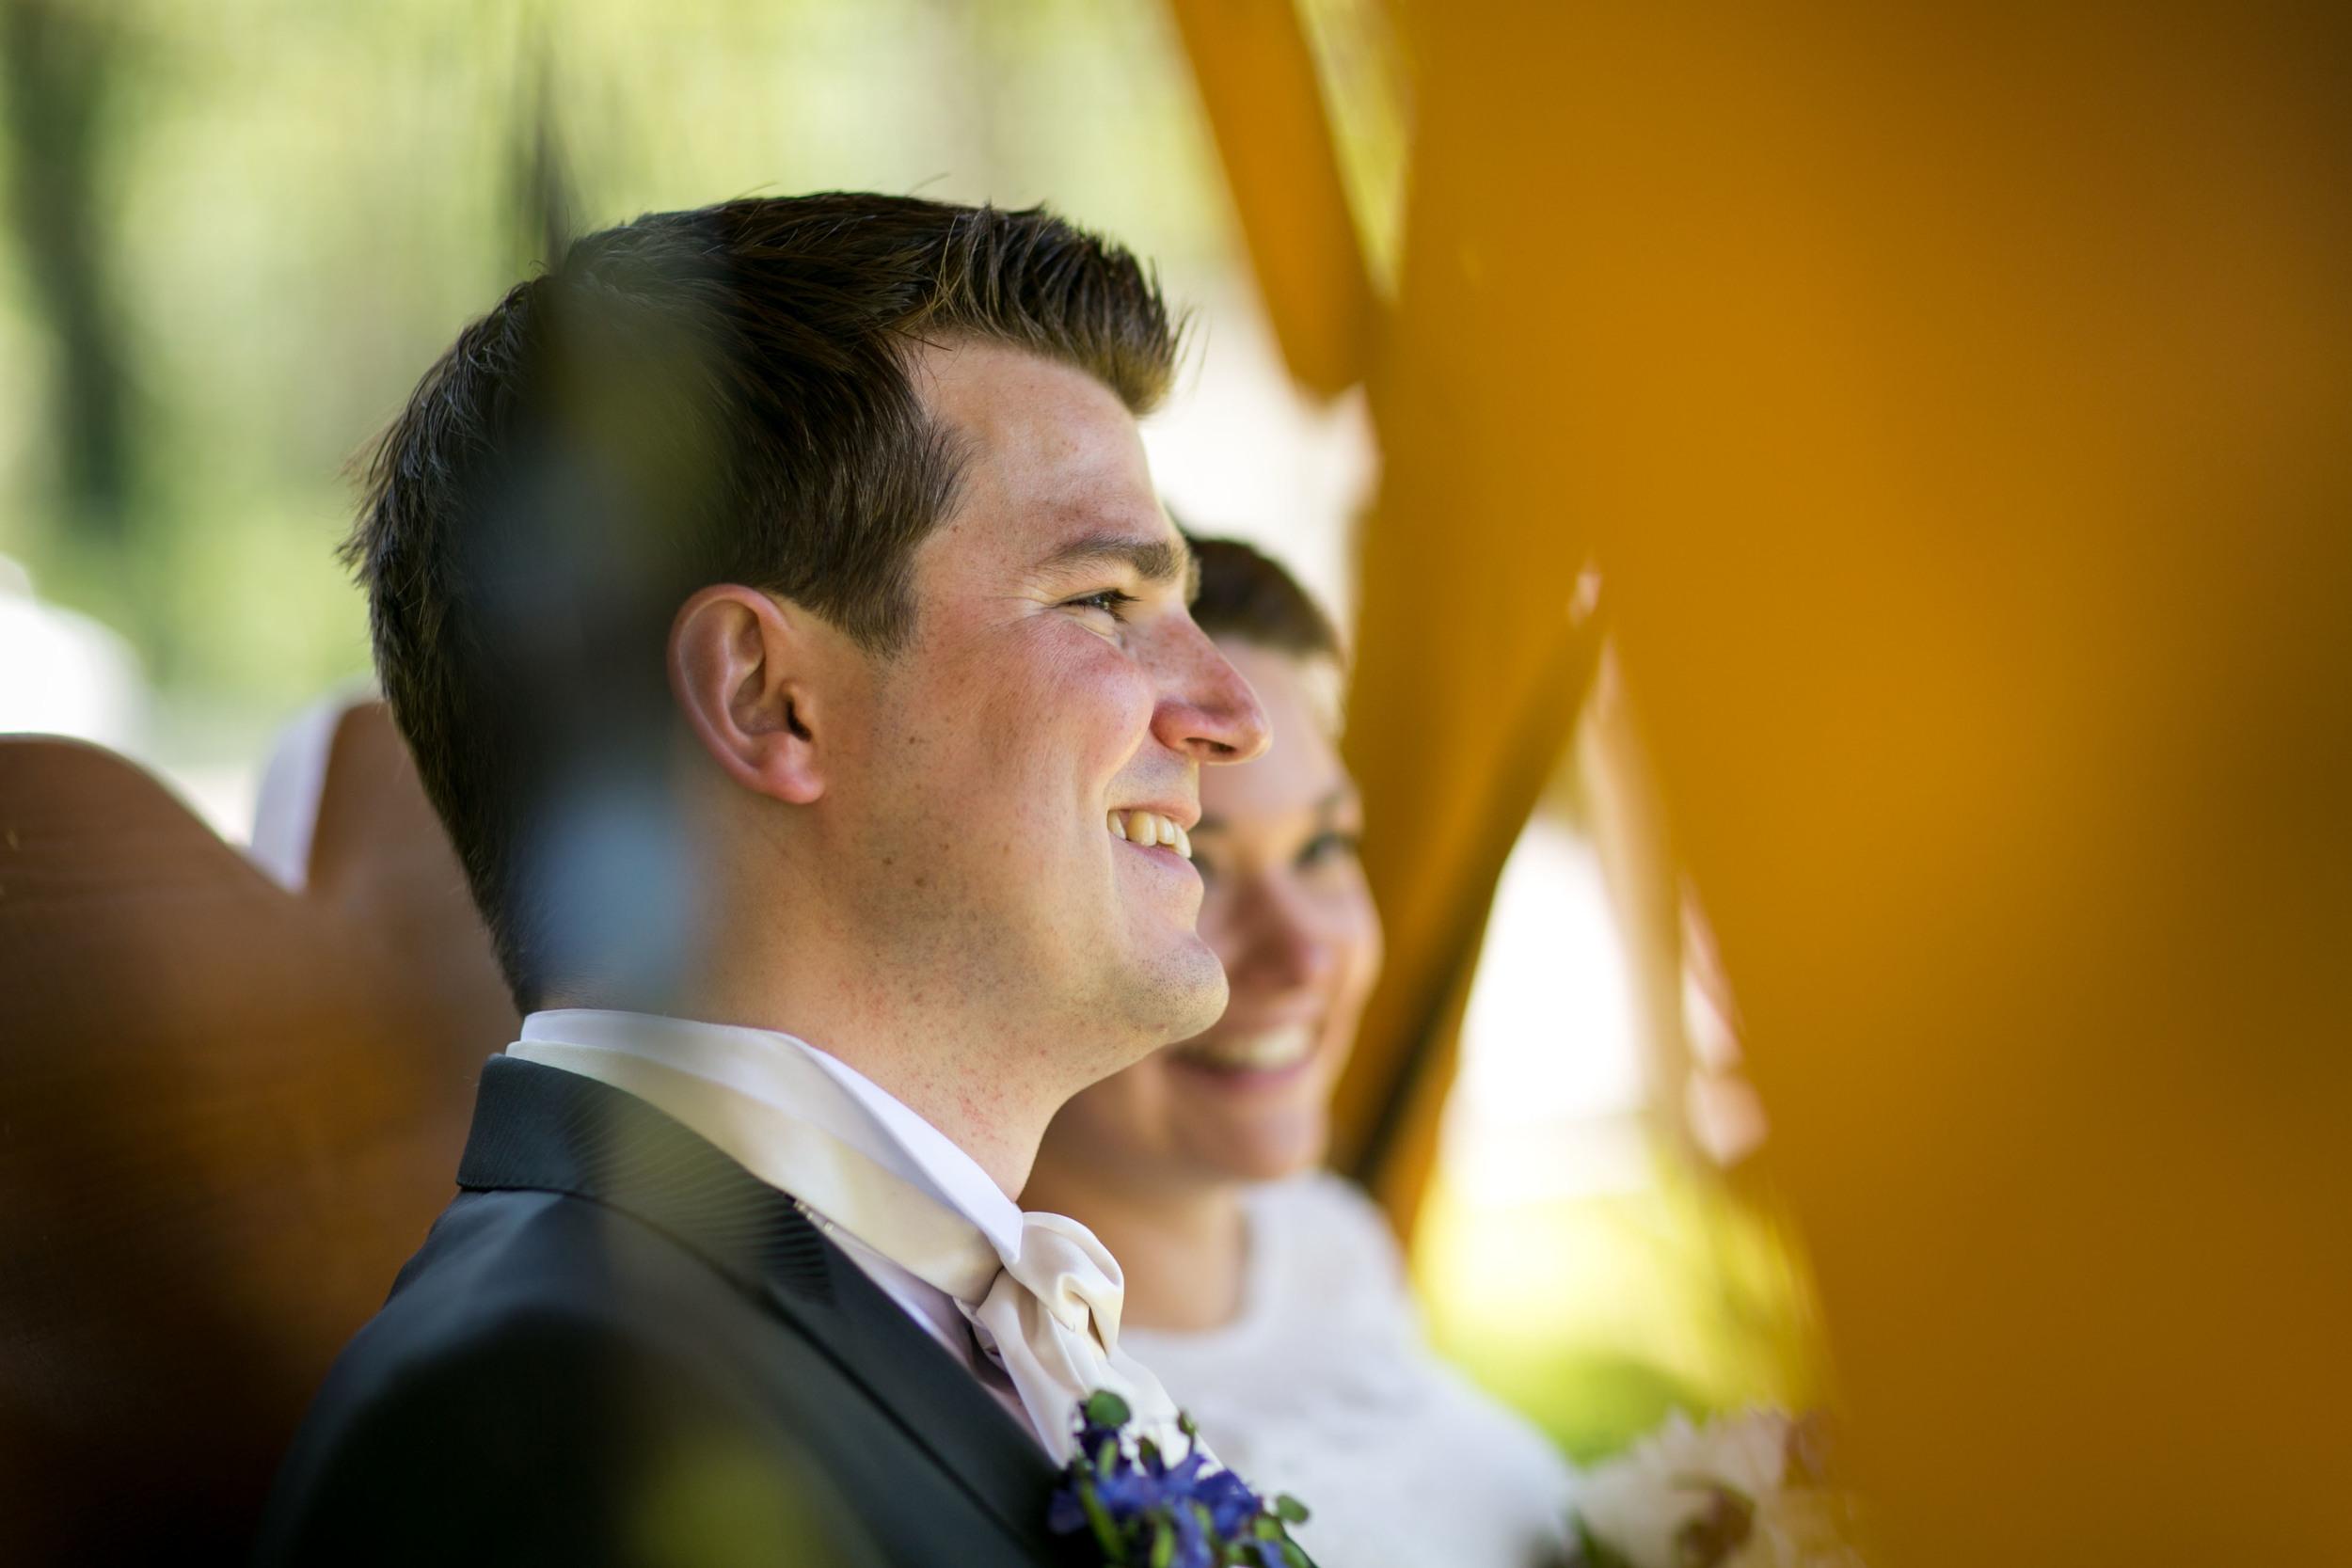 Hochzeitsfotografie Berlin_Fran Burrows Fotografie-174.jpg